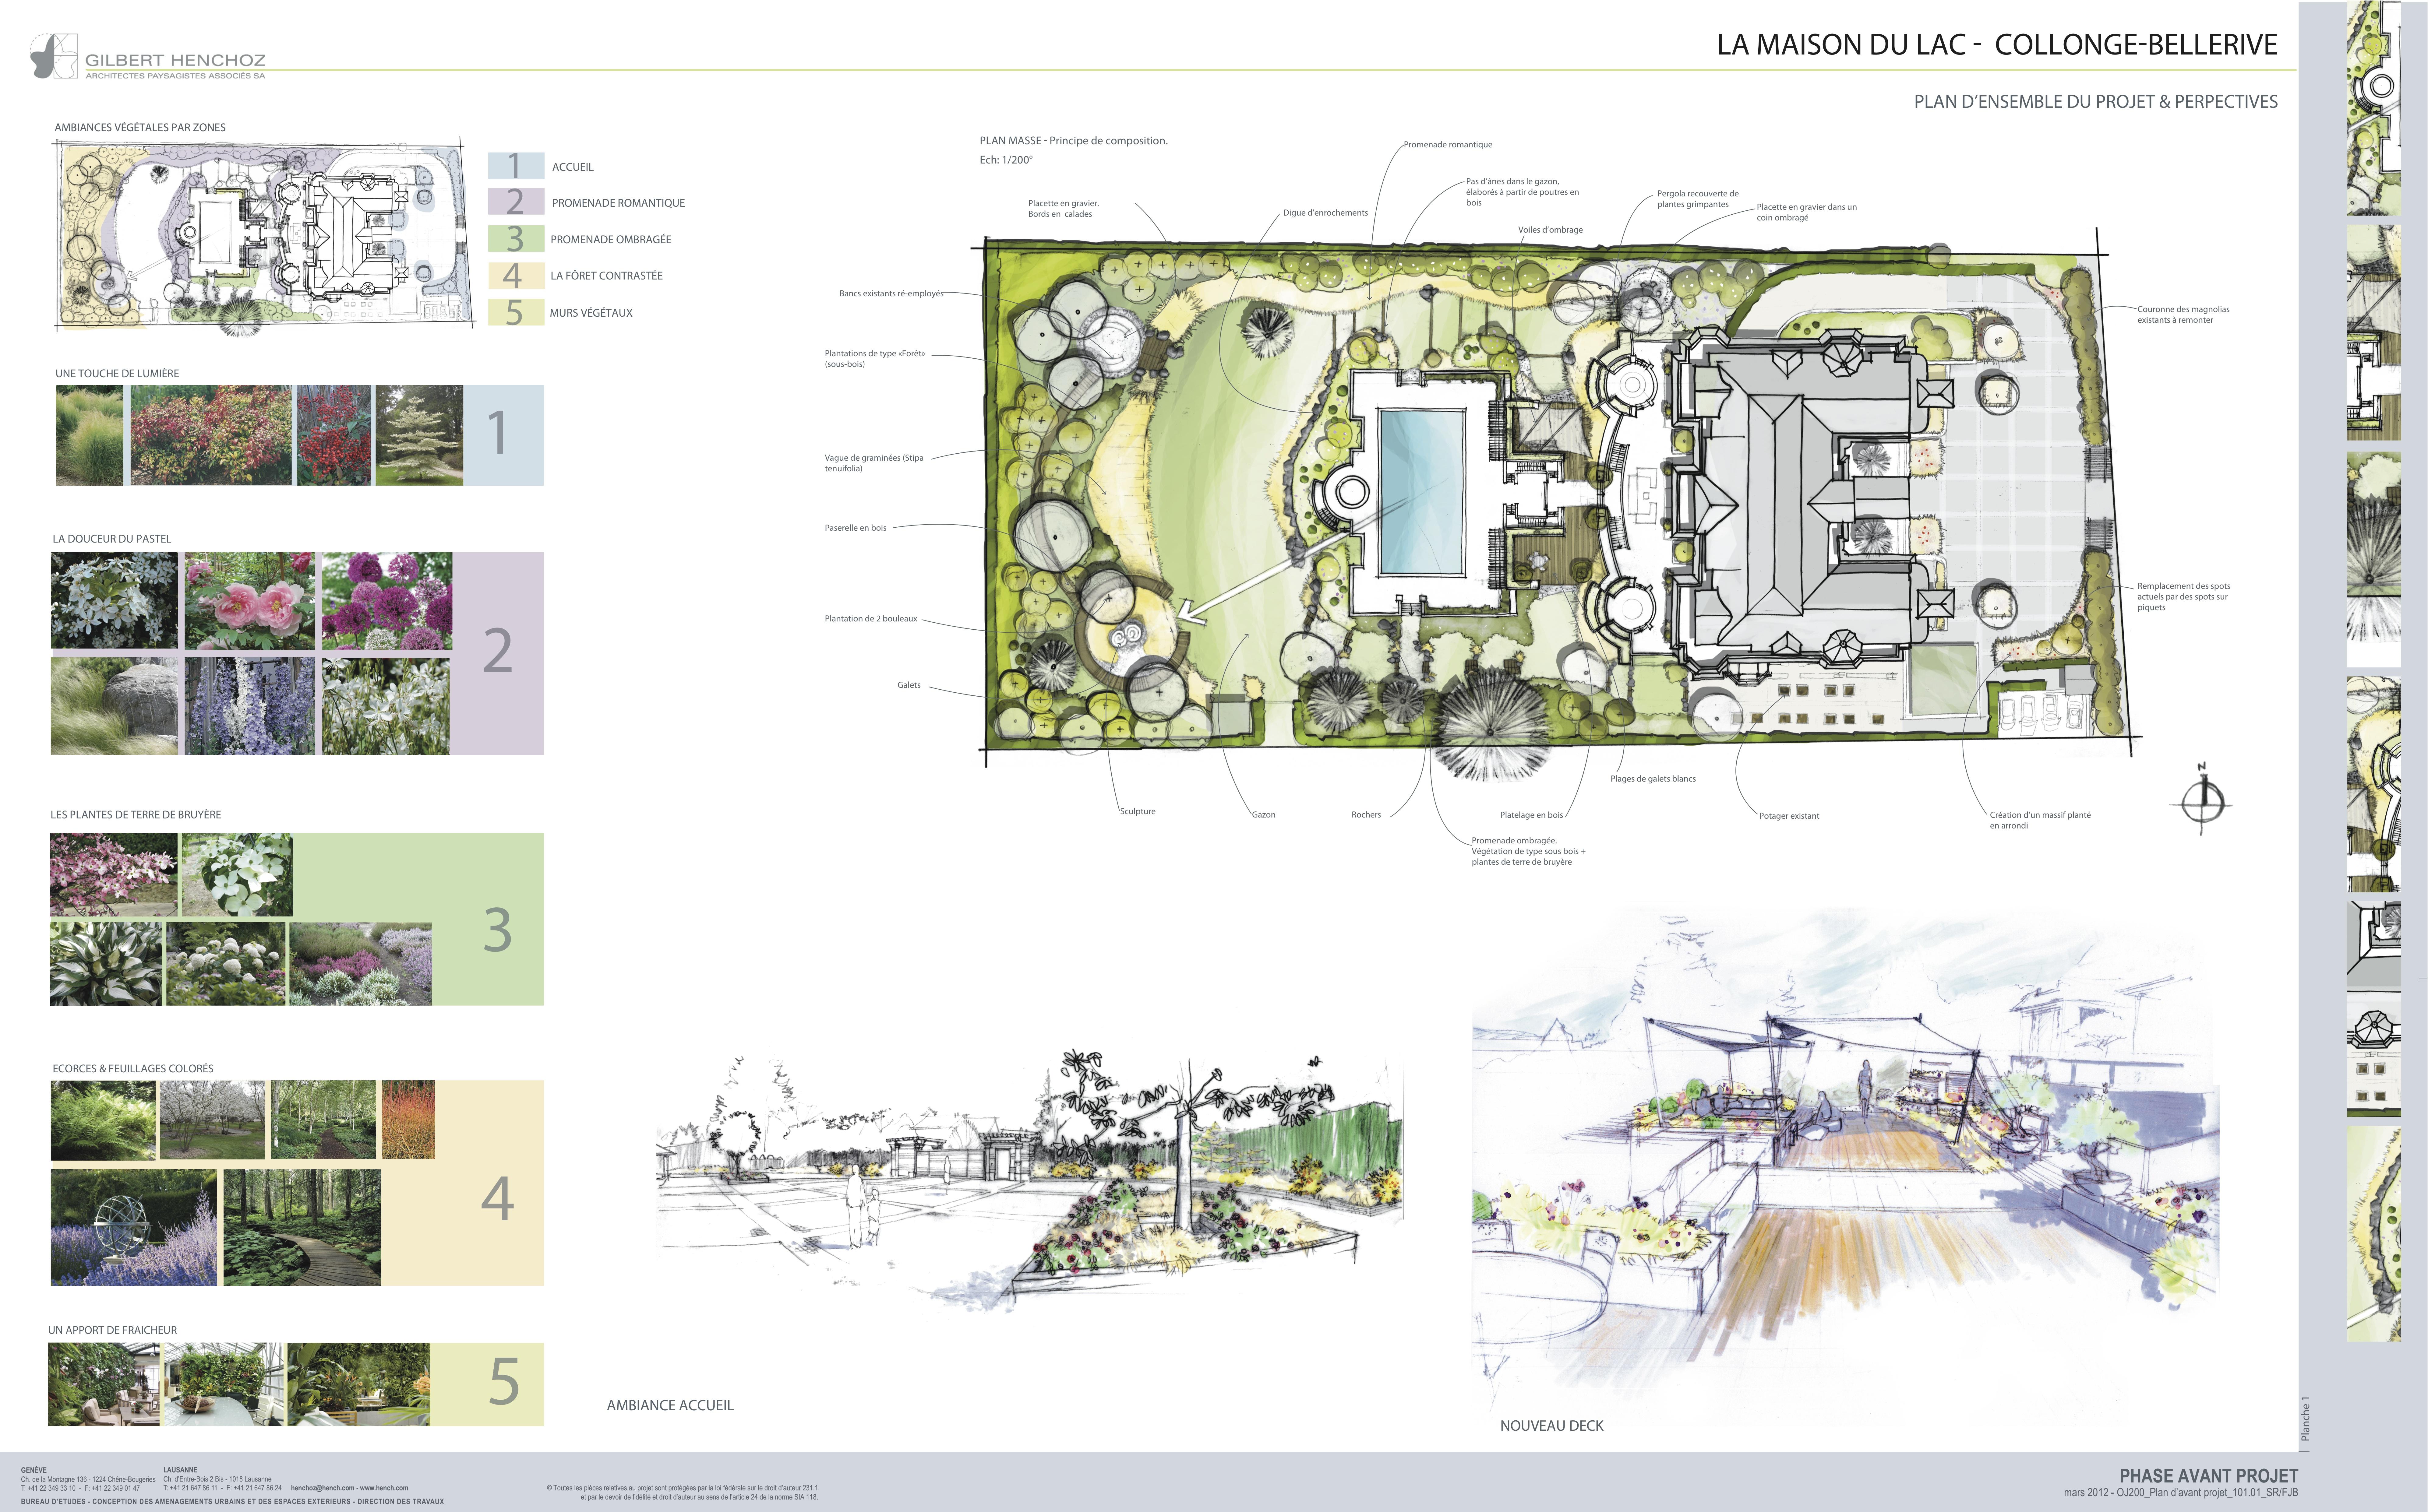 projets particuliers architecte paysagiste conseils. Black Bedroom Furniture Sets. Home Design Ideas